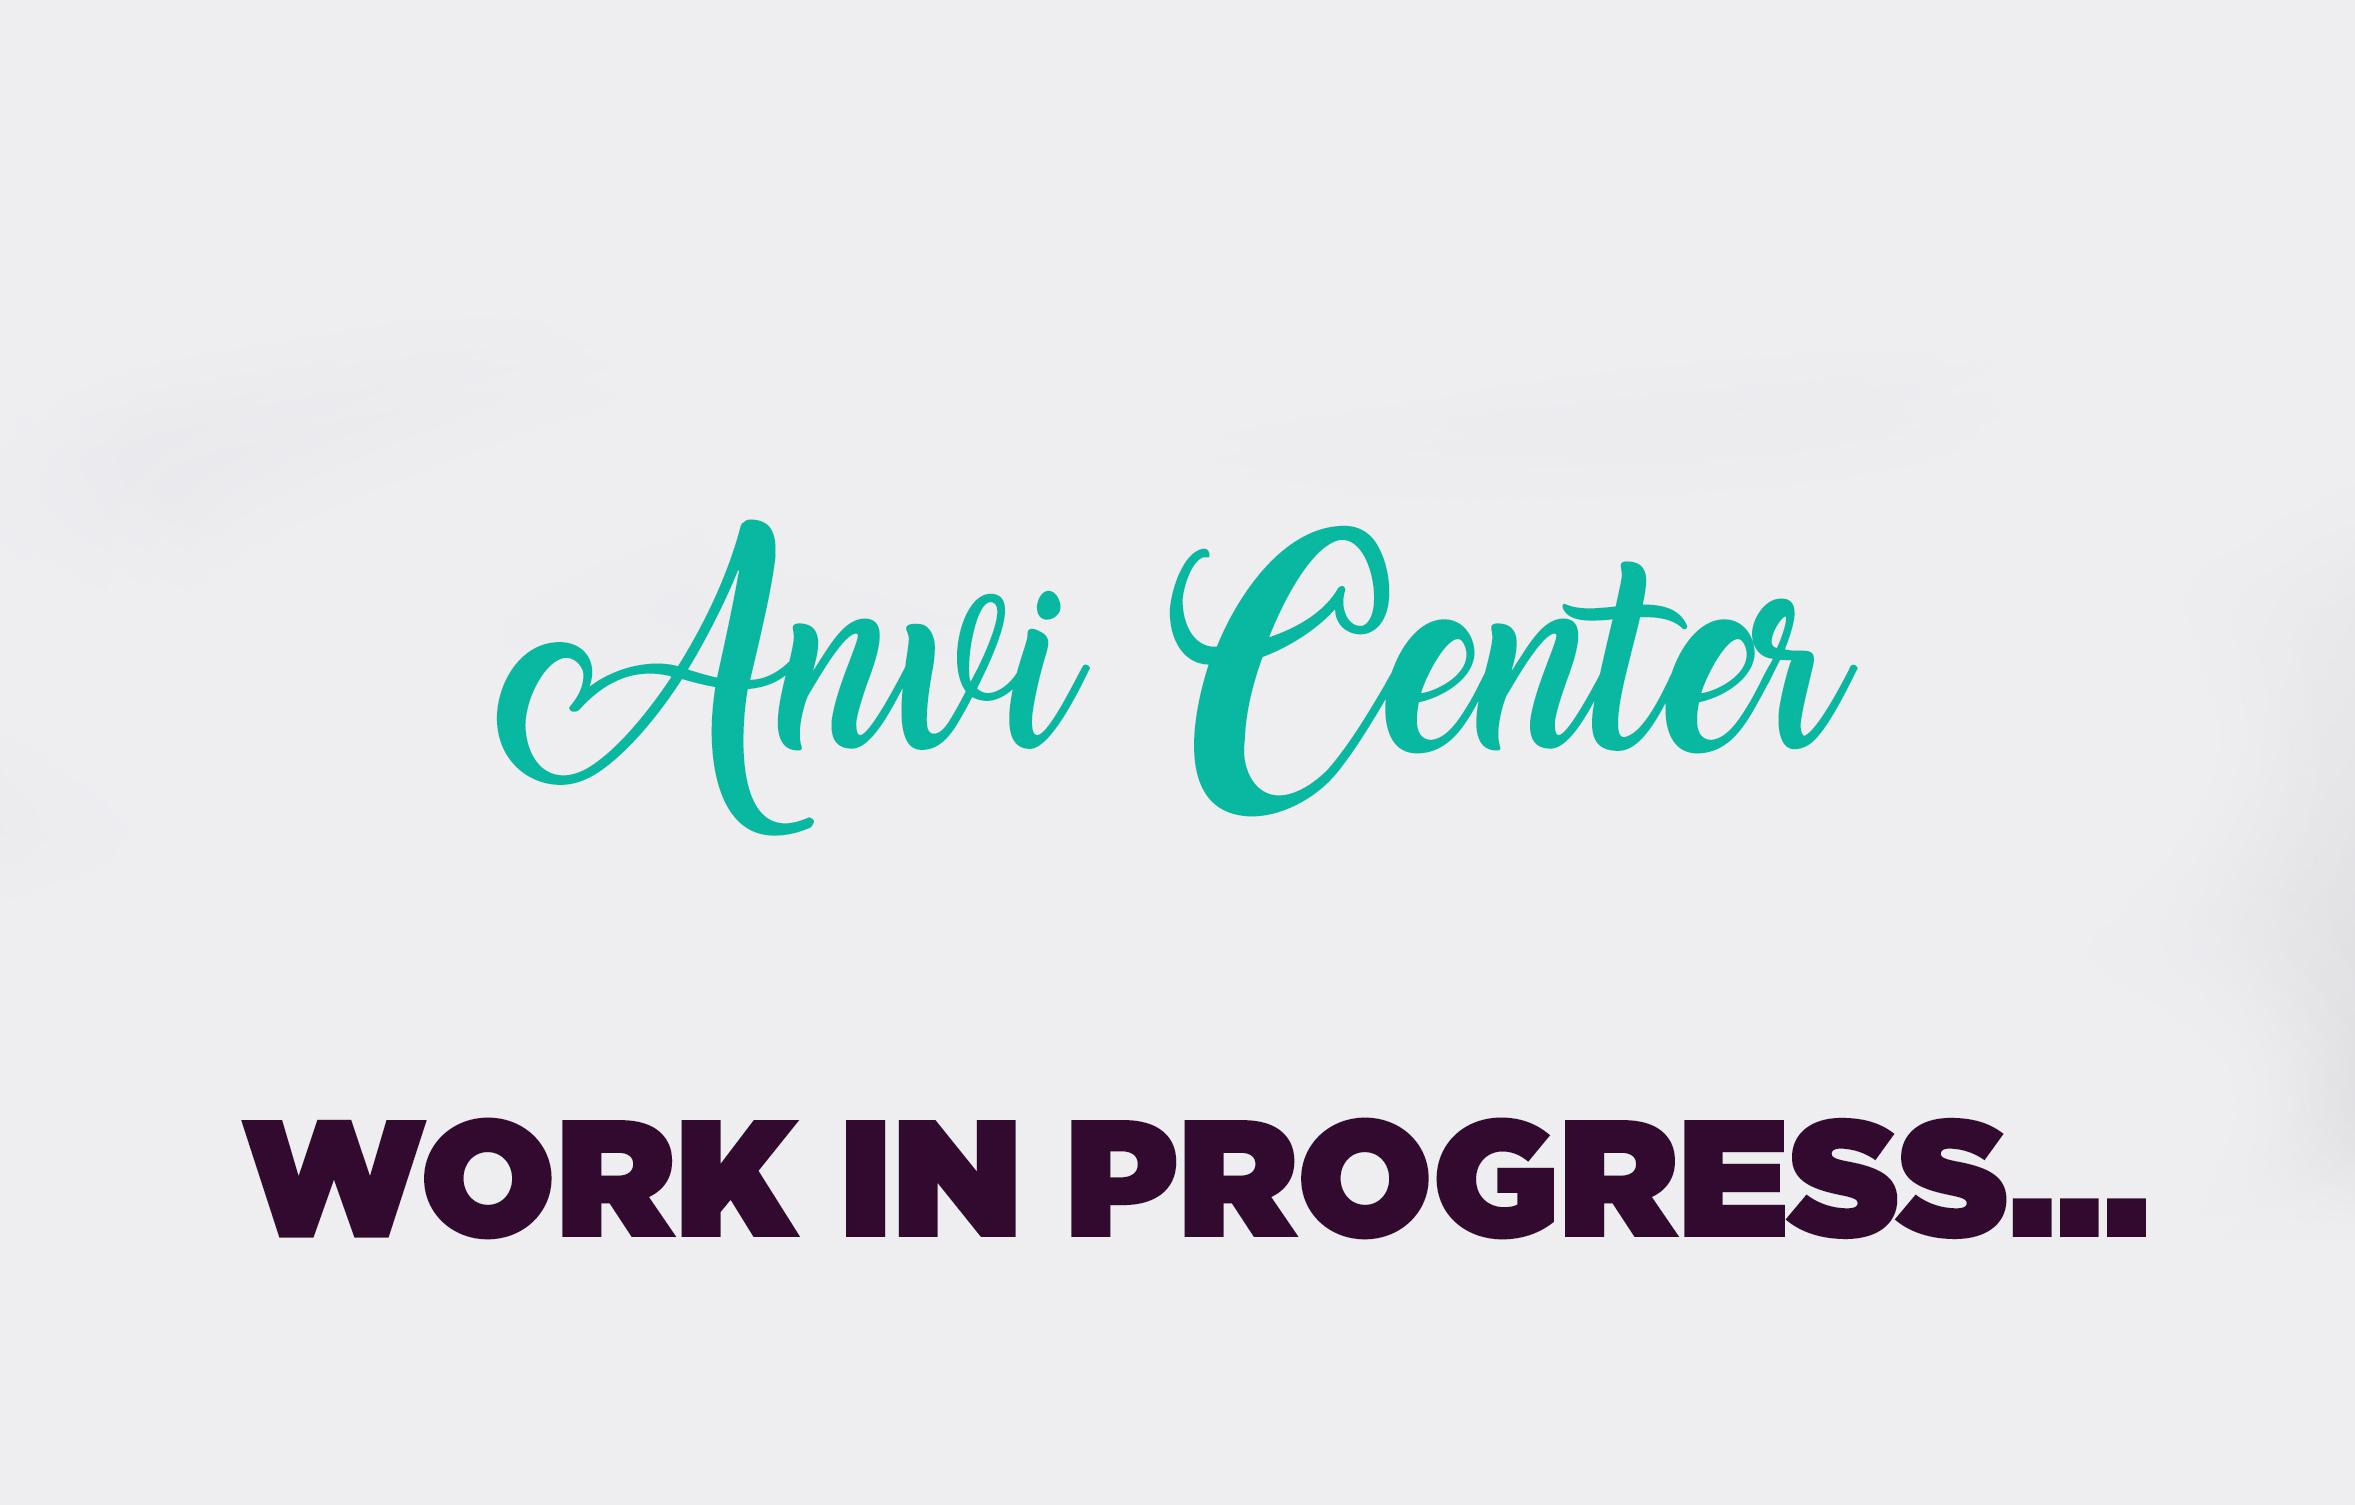 work in progress anvi